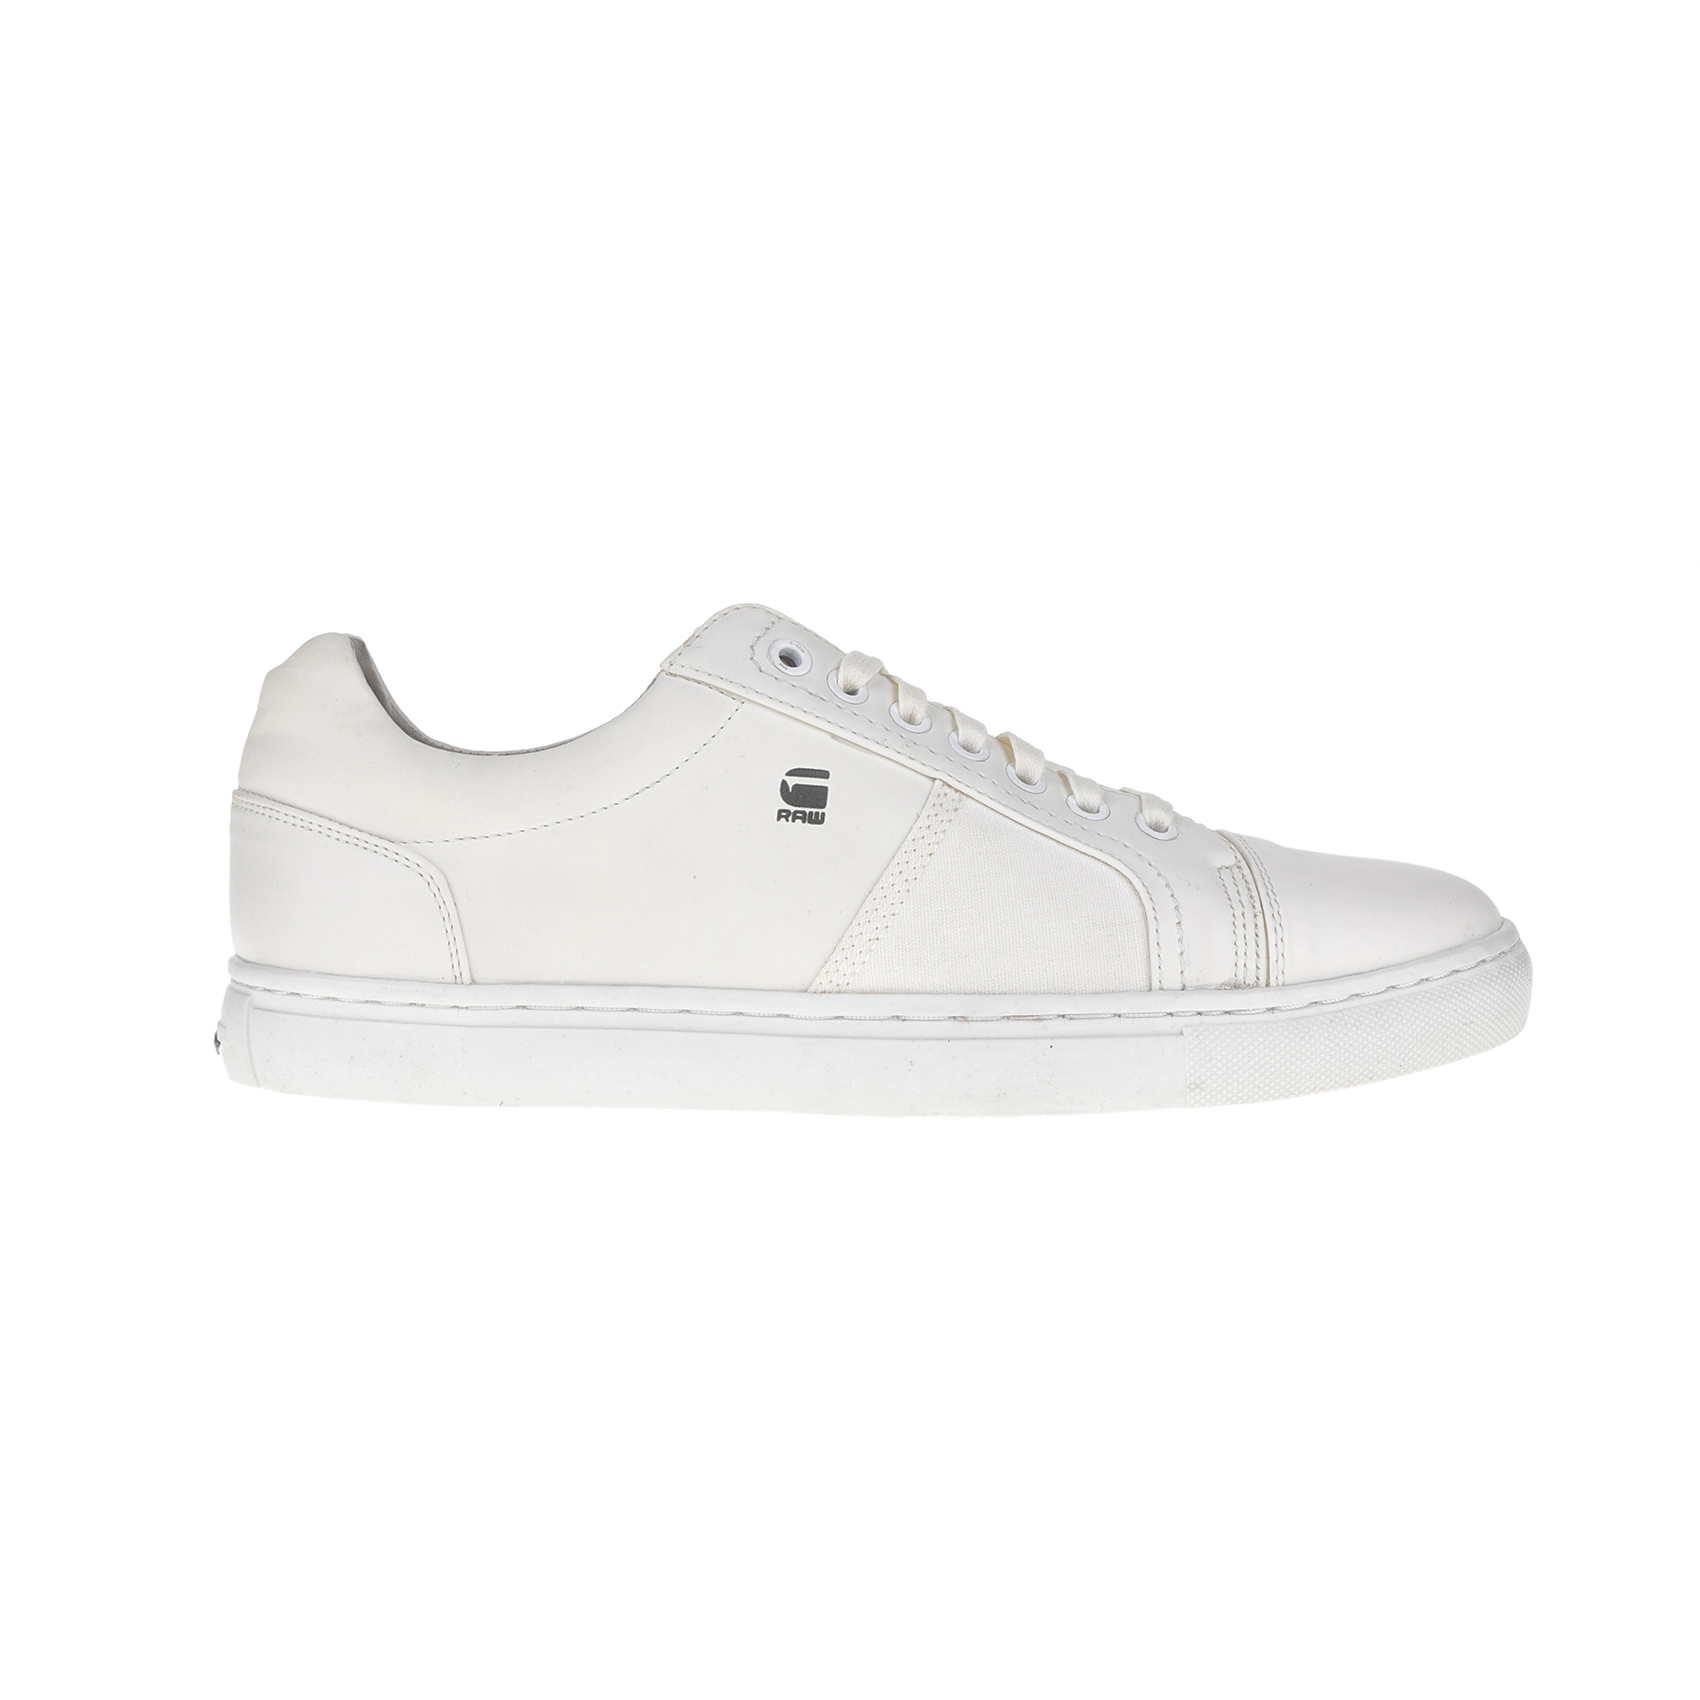 G-STAR RAW – Ανδρικά παπούτσια G-STAR TOUBLO λευκά